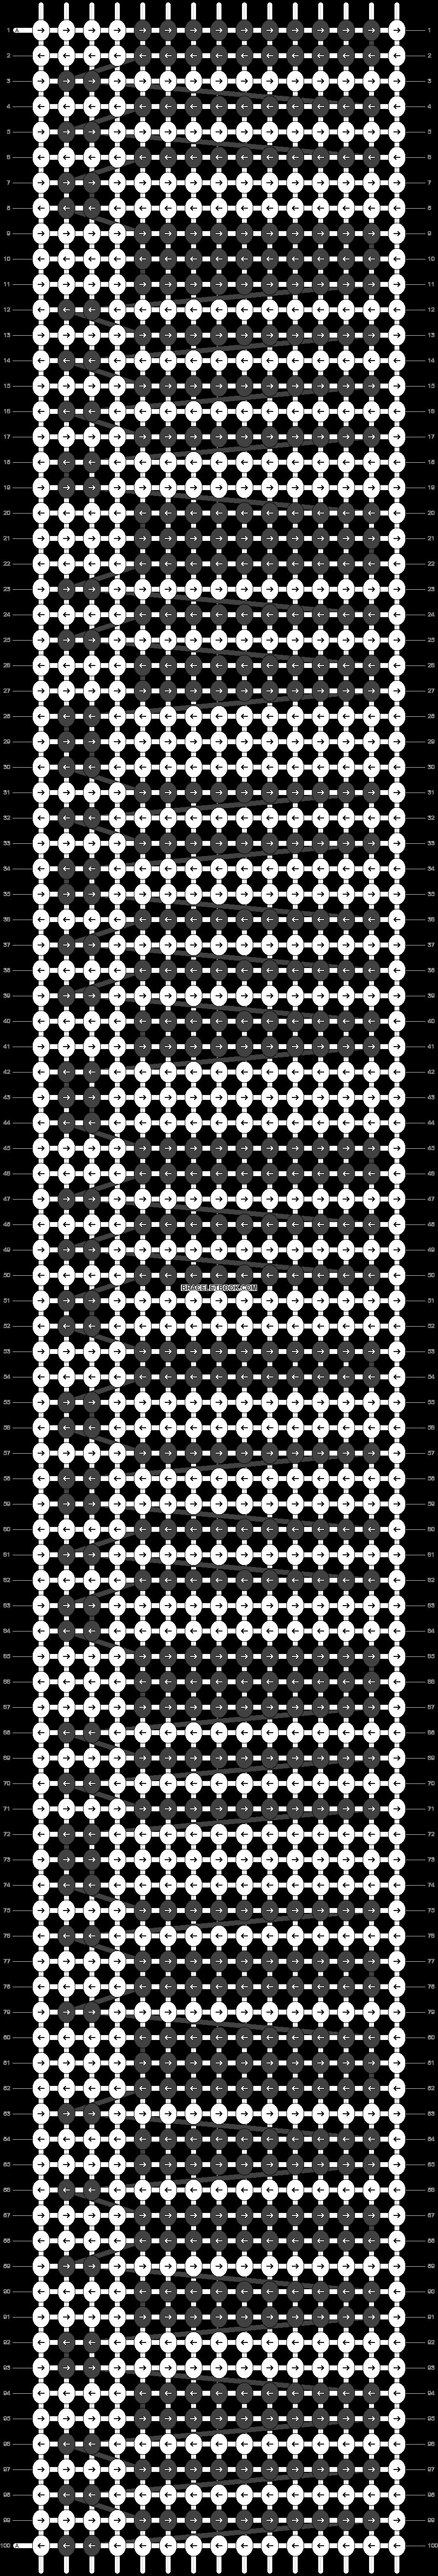 Alpha pattern #15571 pattern